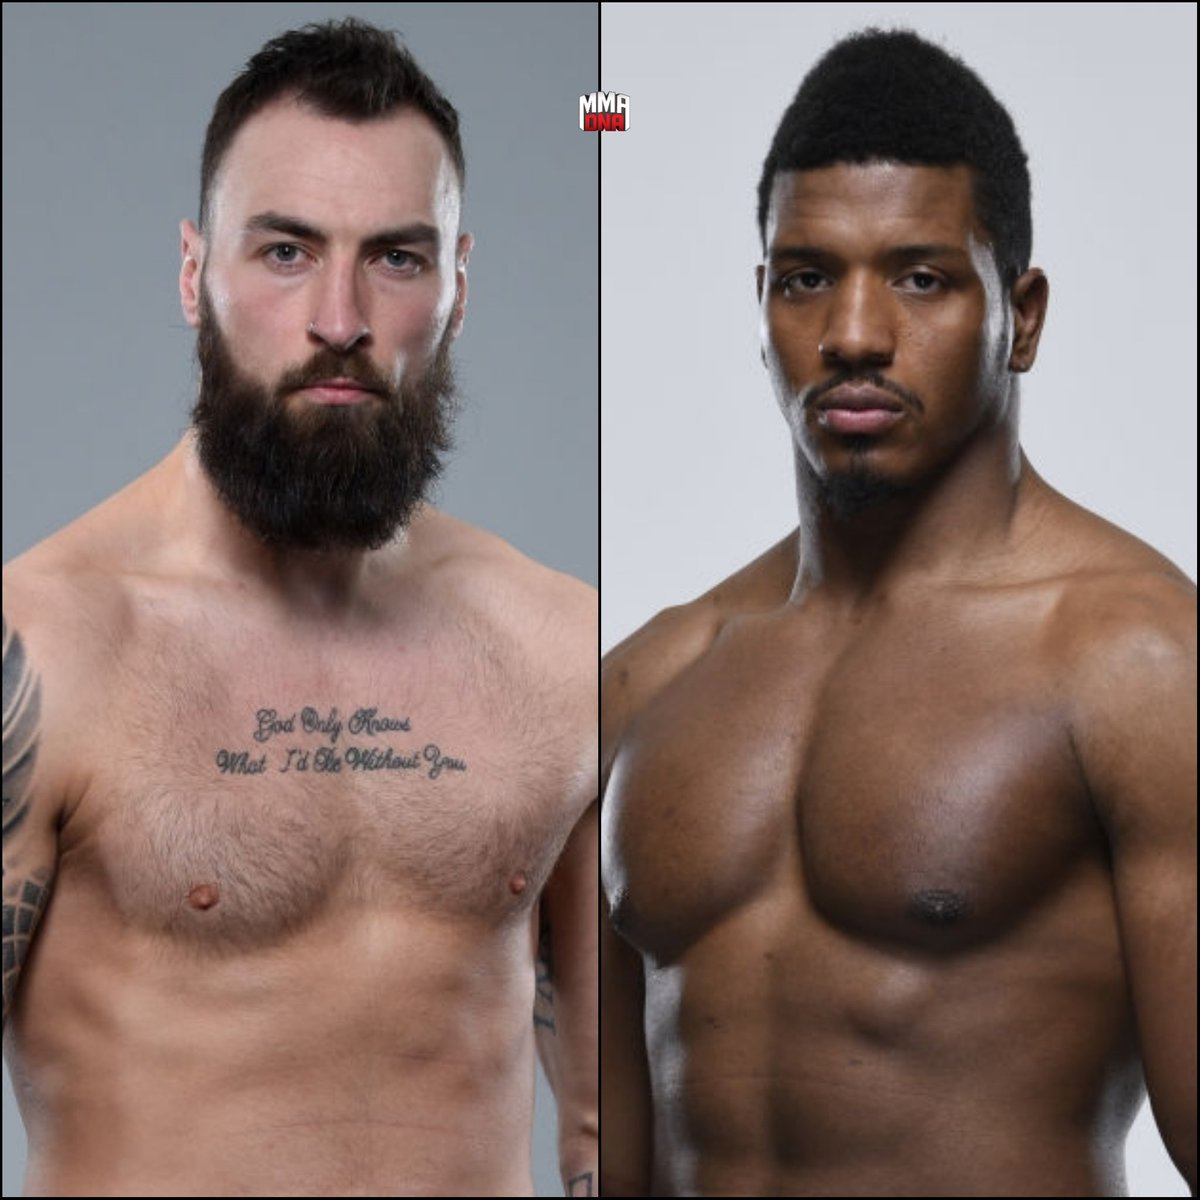 Paul Craig will fight Alonzo Menifield at #UFConESPN3 in Minneapolis, Minnesota. (Jun. 29, 2019). #UFC #MMA #UFCMinneapolis